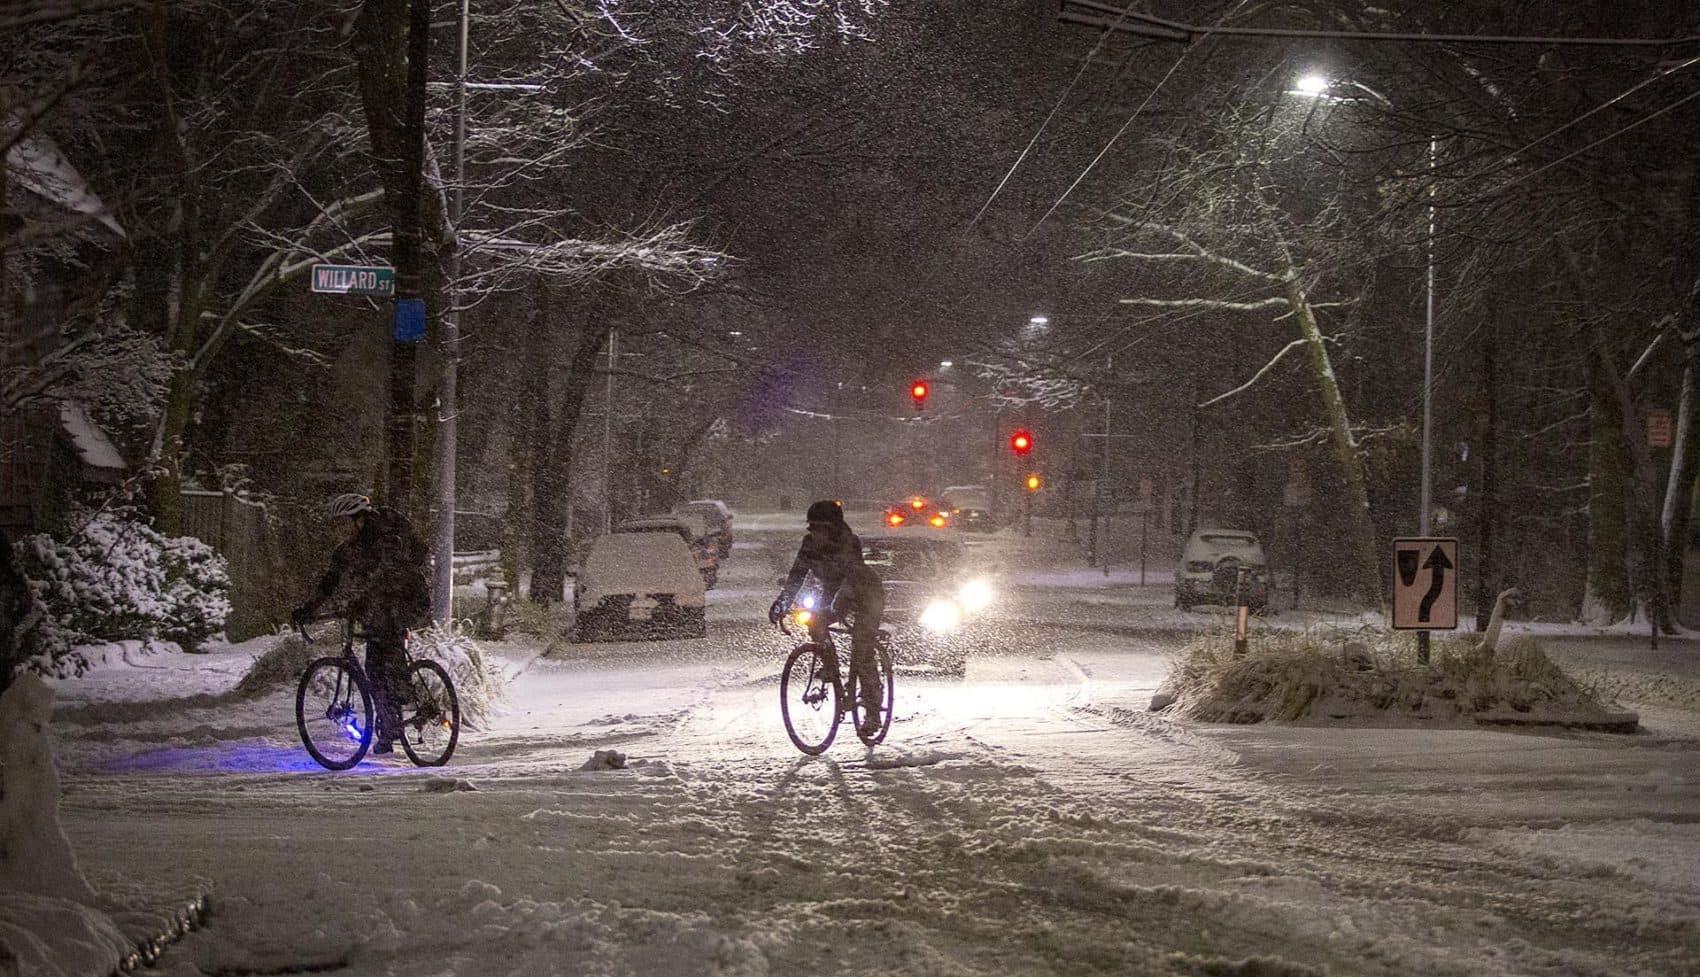 Bicyclists make a turn off a snowy Mount Auburn Street on Sunday evening. (Robin Lubbock/WBUR)